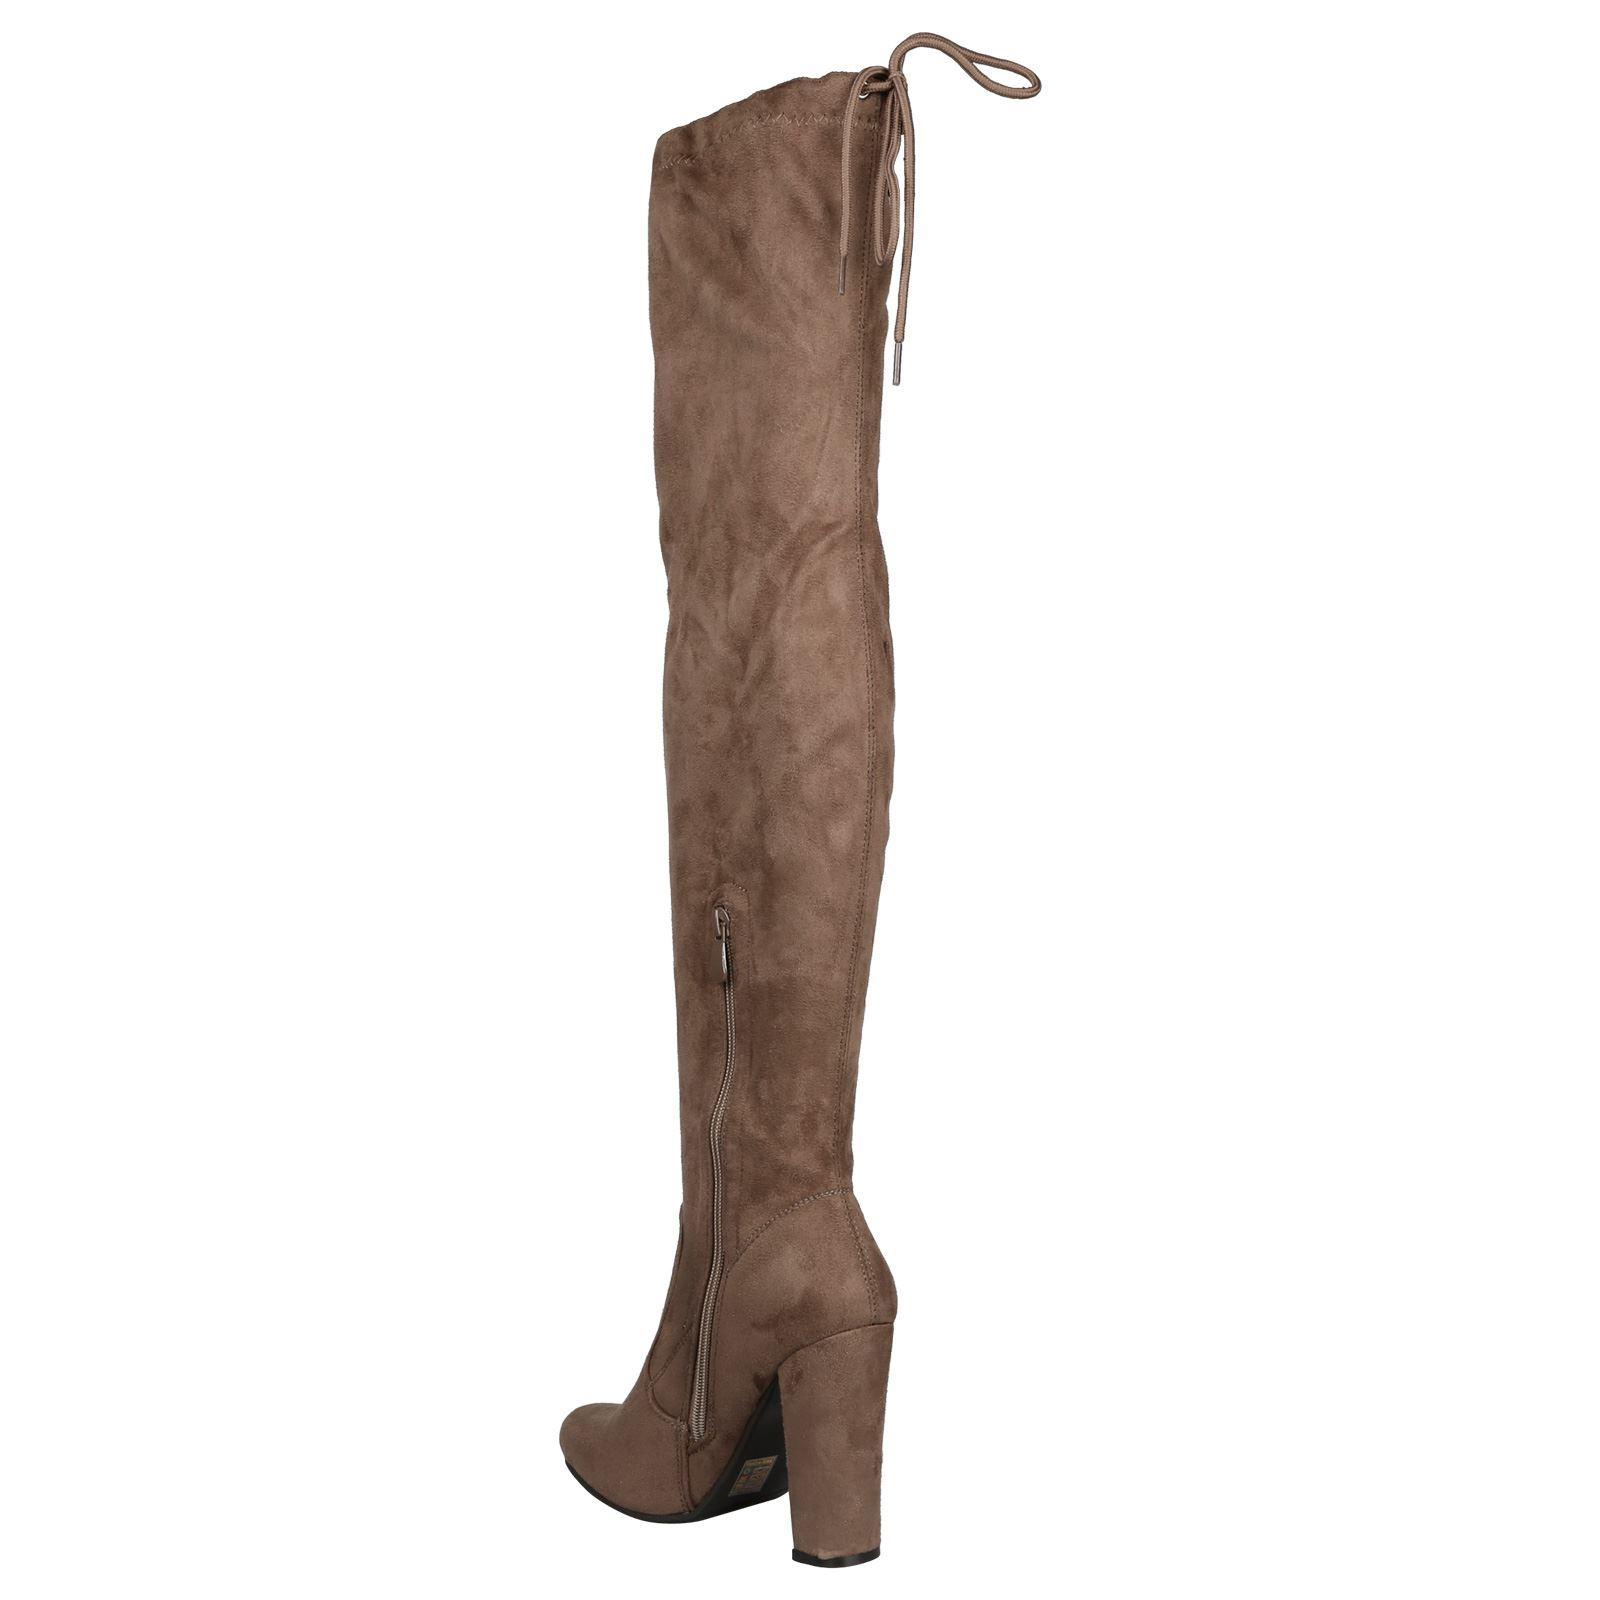 Iliana-Womens-Knee-High-Zip-Up-Adjustable-Pull-Strings-Mid-High-Block-Heel-Boots thumbnail 9